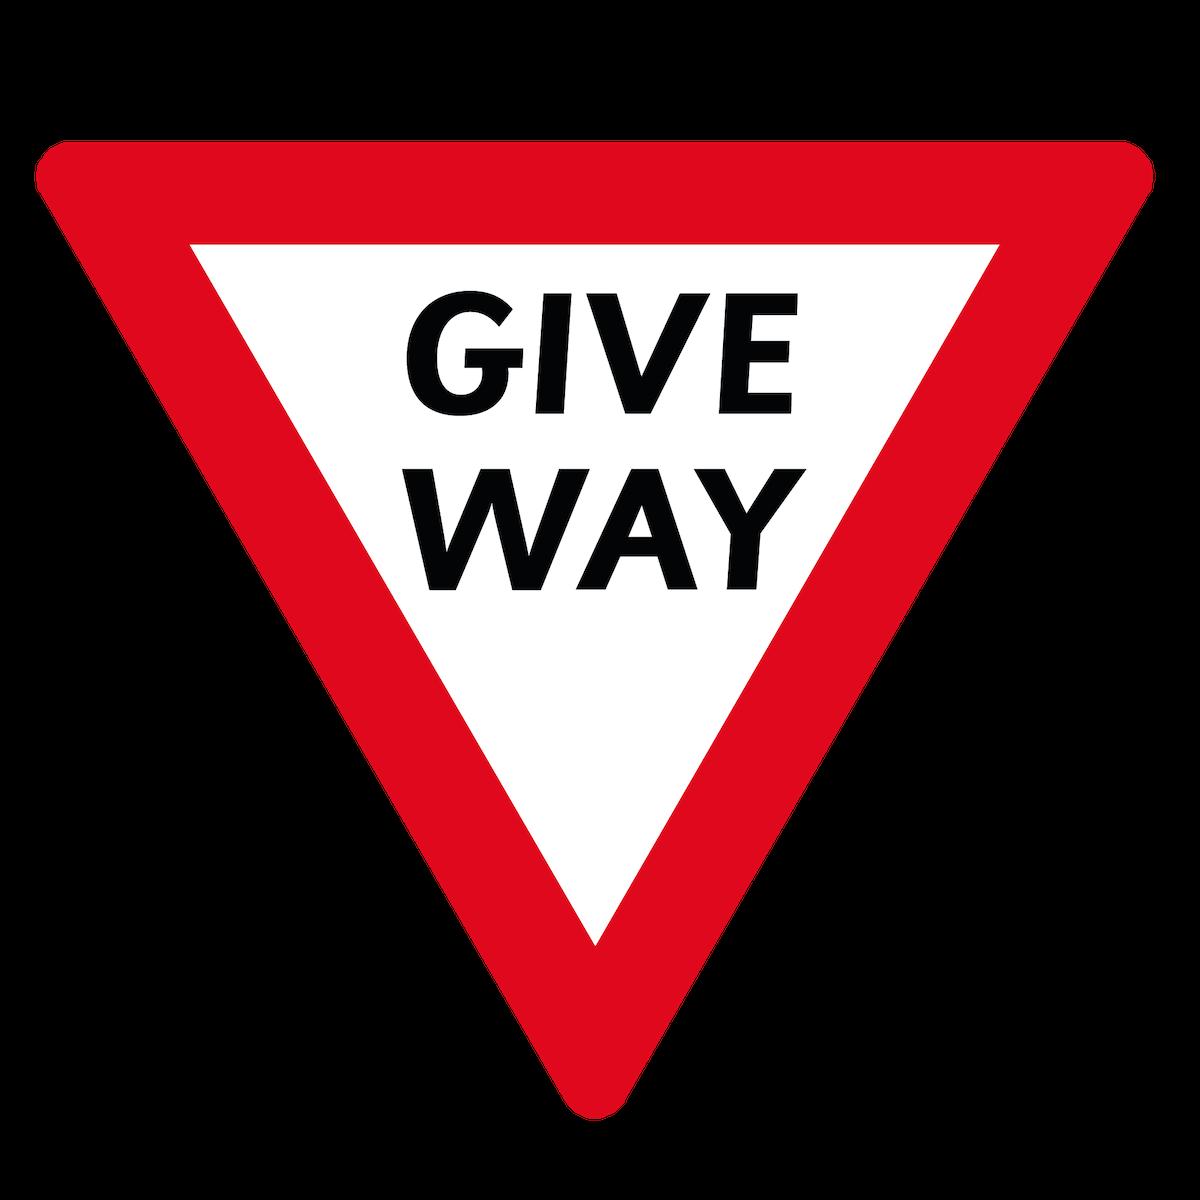 Playground Marking Give Way